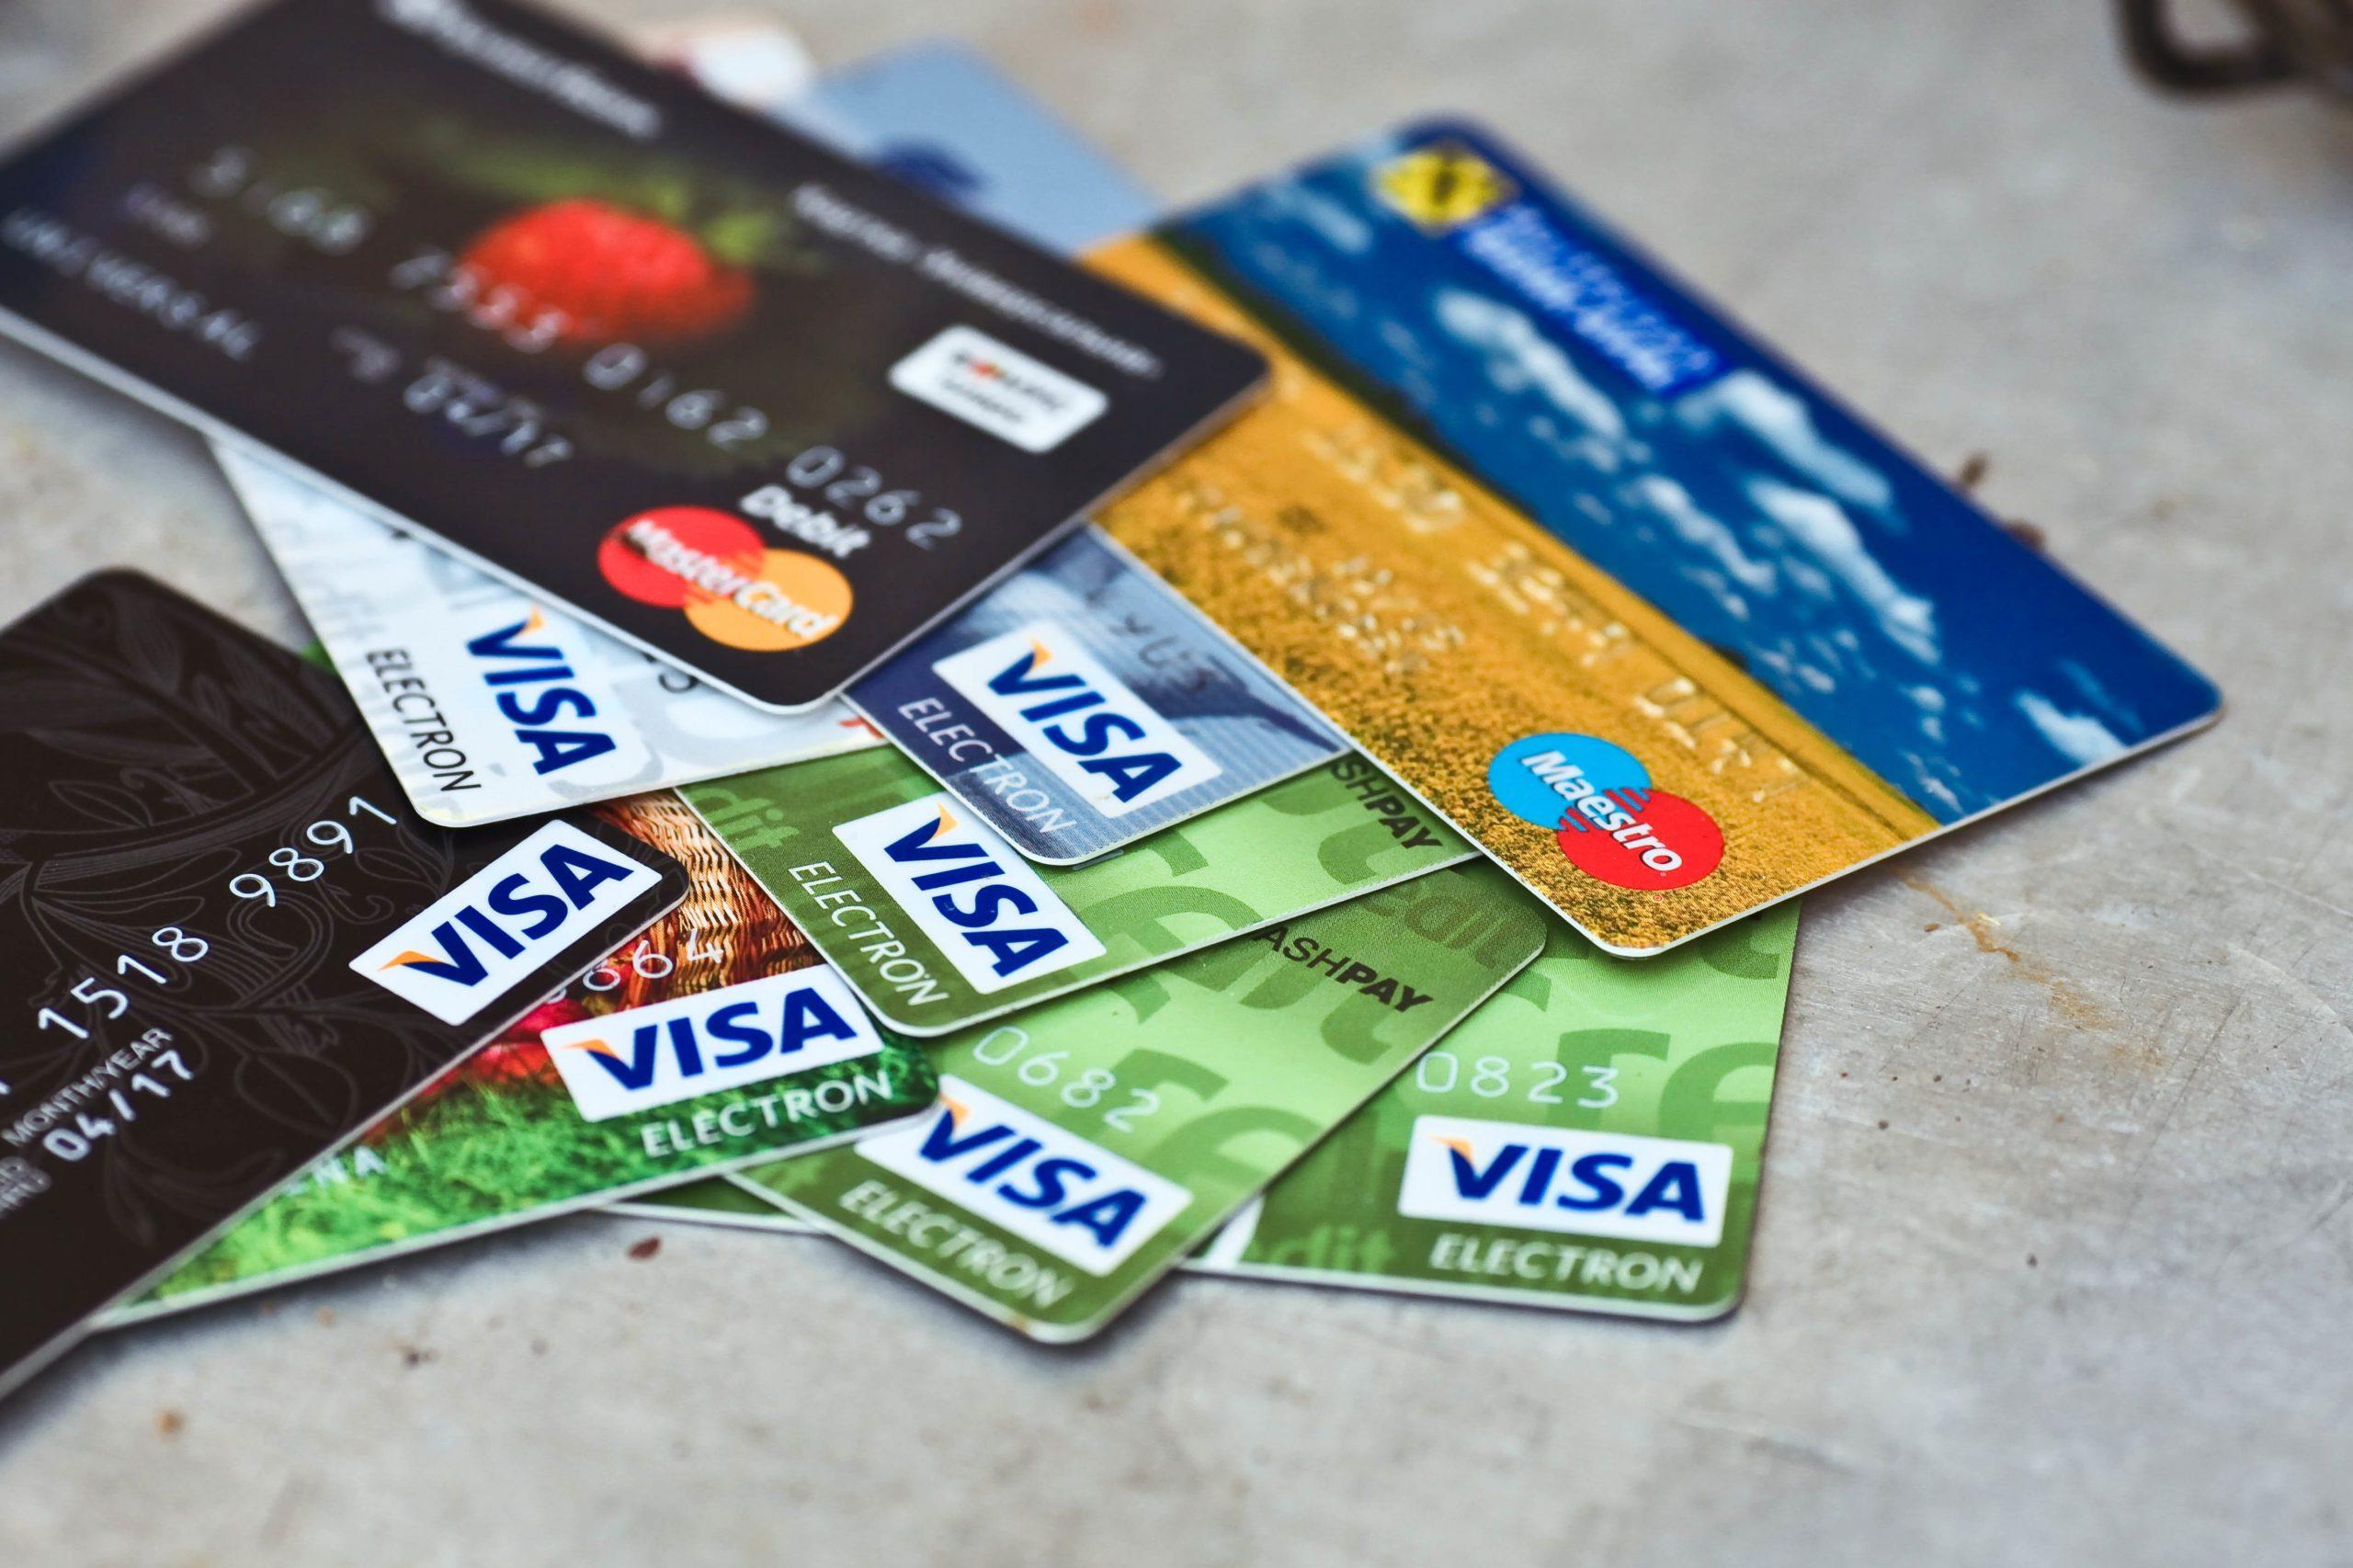 На Бали опасно пользоваться банковскими картами